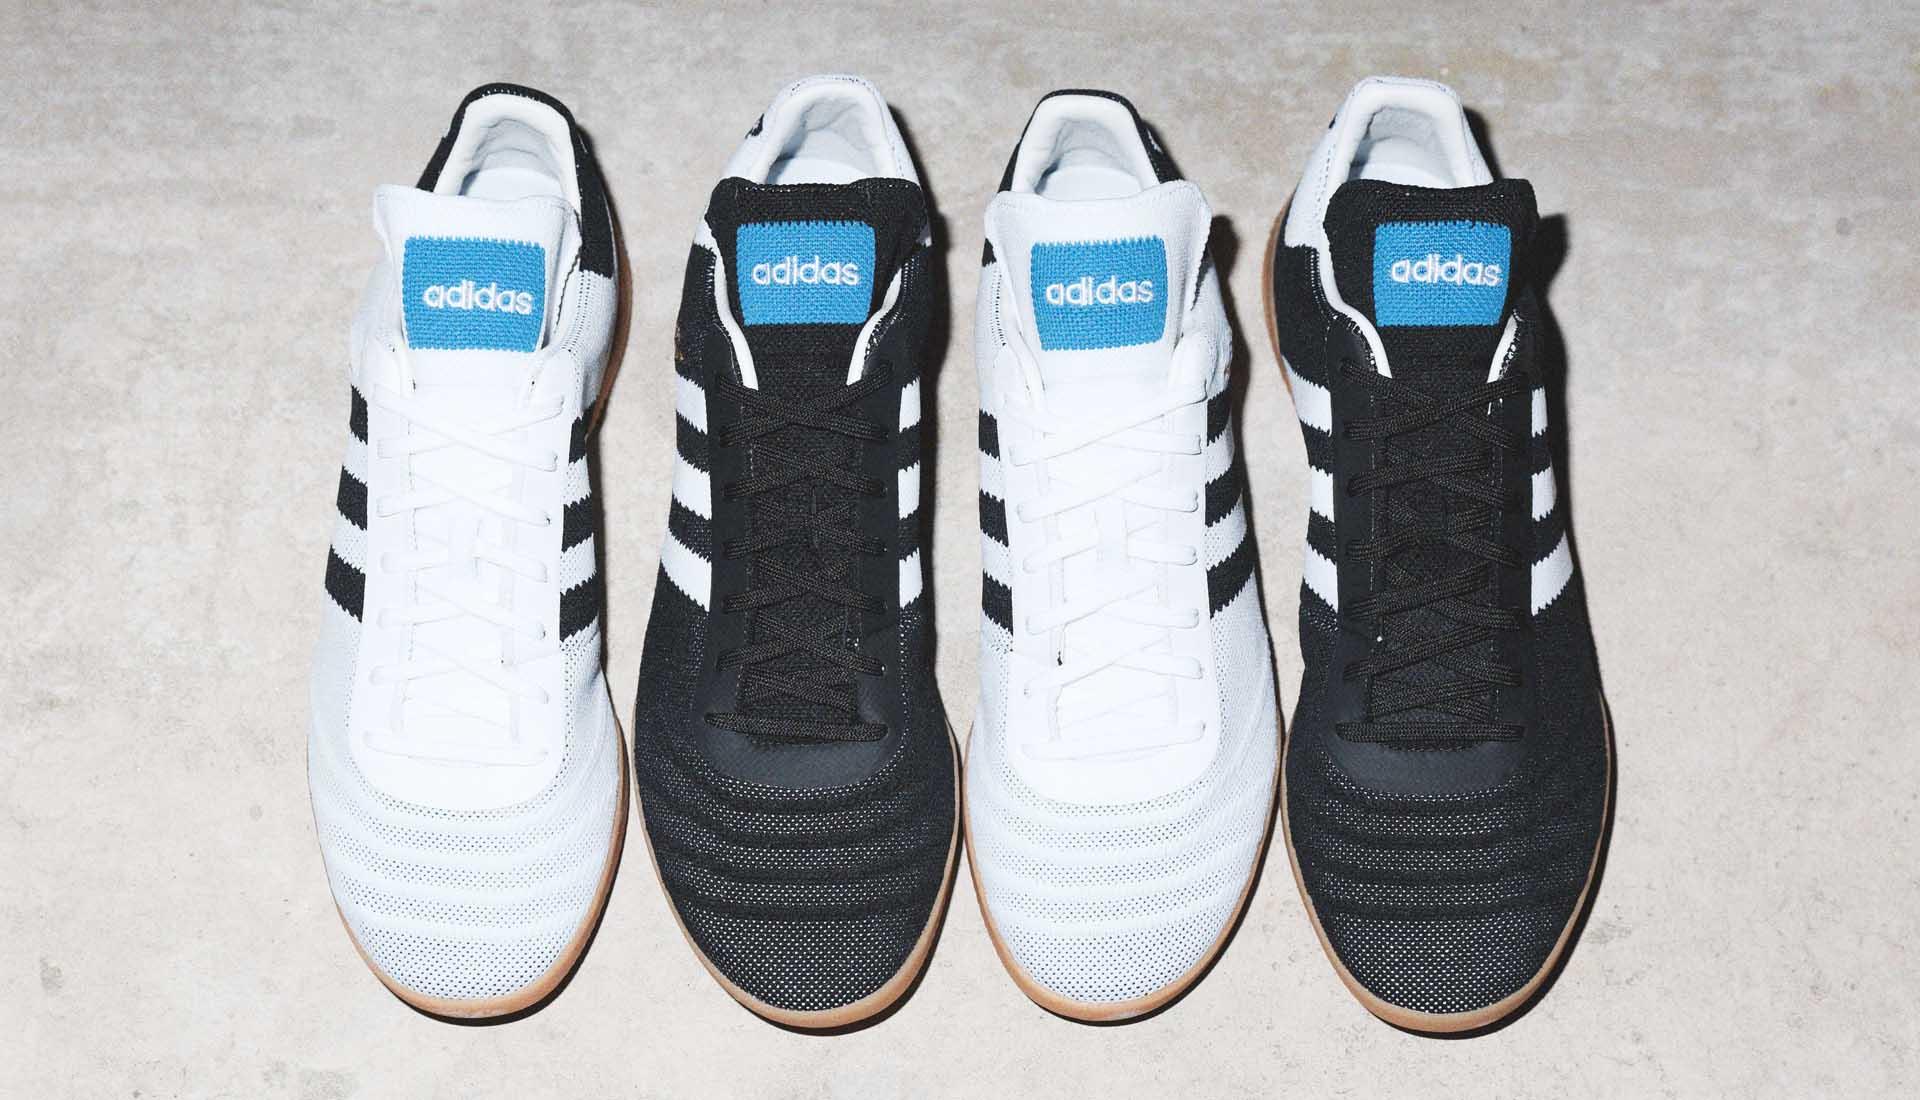 hot sale online 2cd22 4528a 3-adidas-copa-70-sneakers-min.jpg